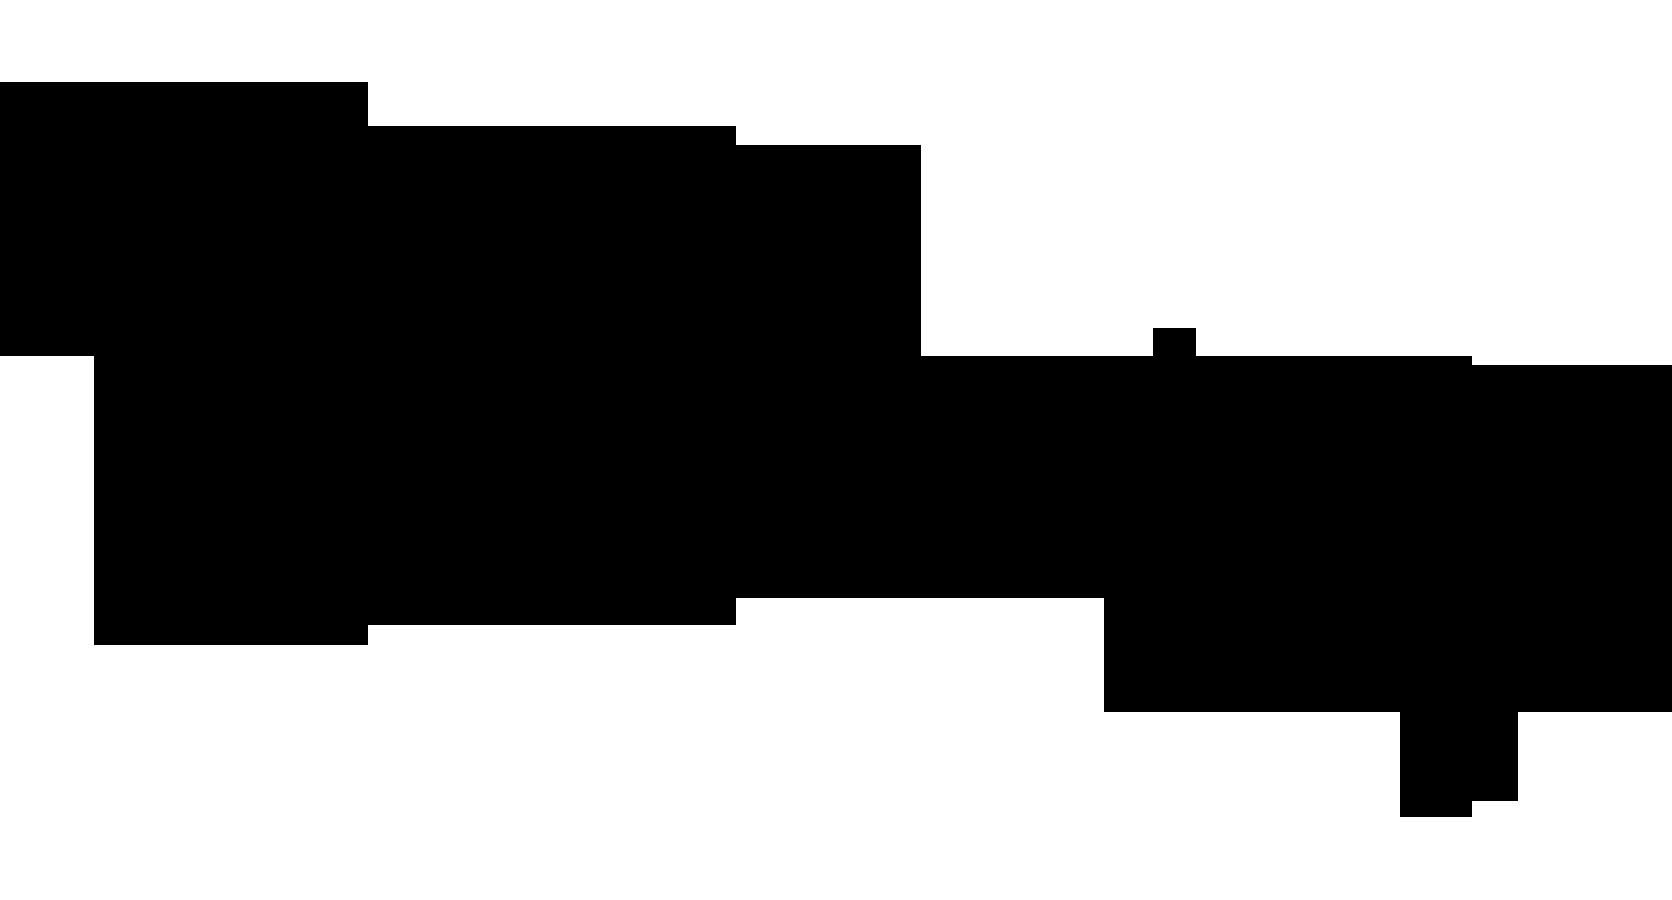 54dc48e0667516d7cd33d400ef9d8e20